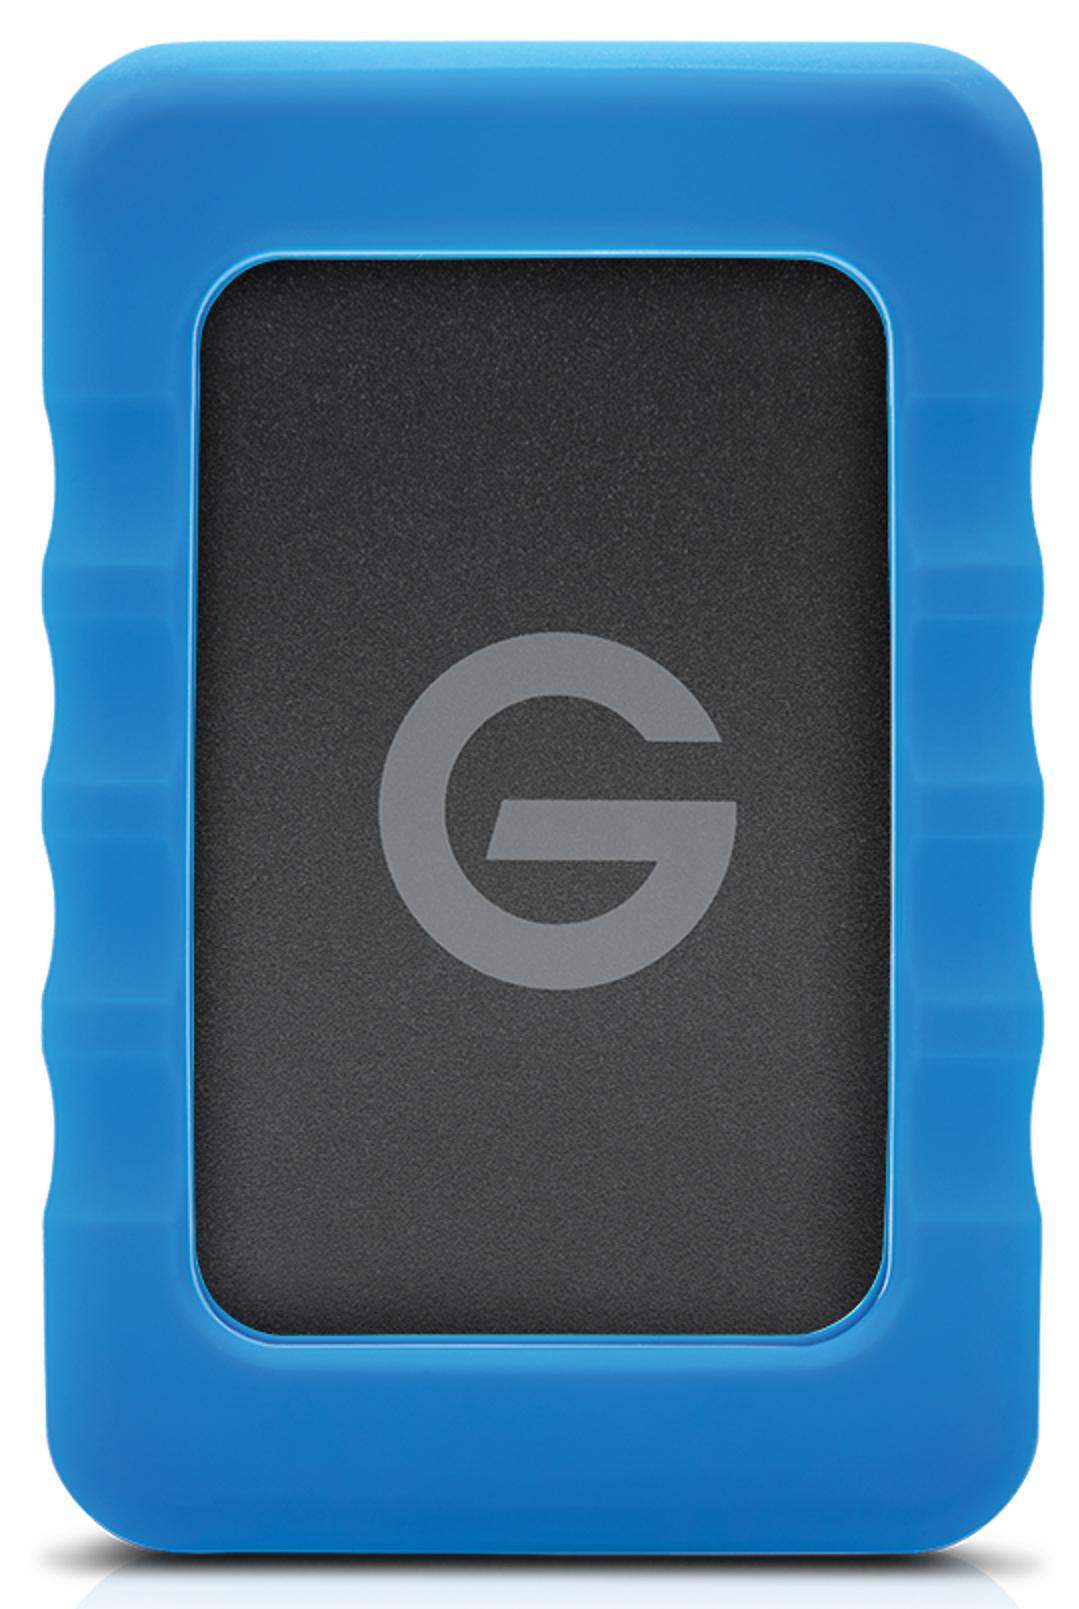 1TB Portable Hard Drive